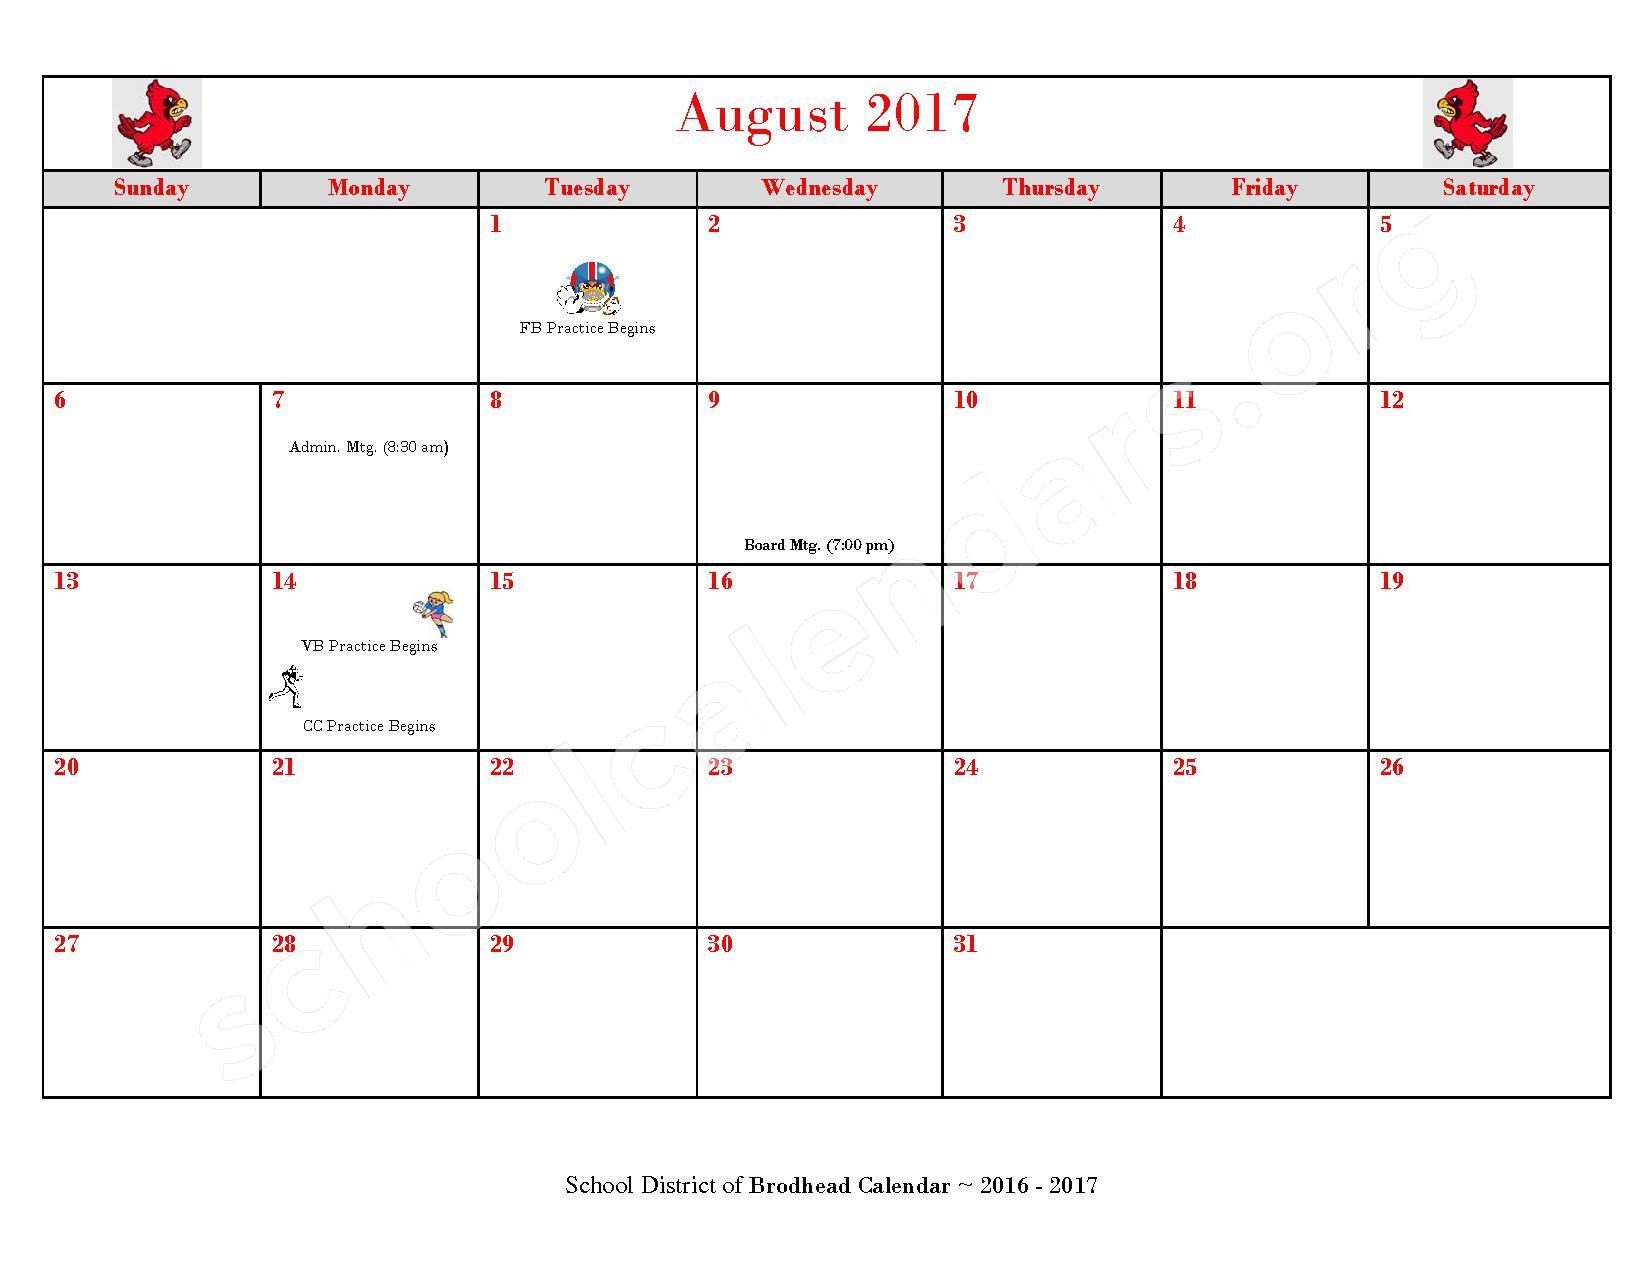 2016 - 2017 School Calendar – Brodhead School District – page 13